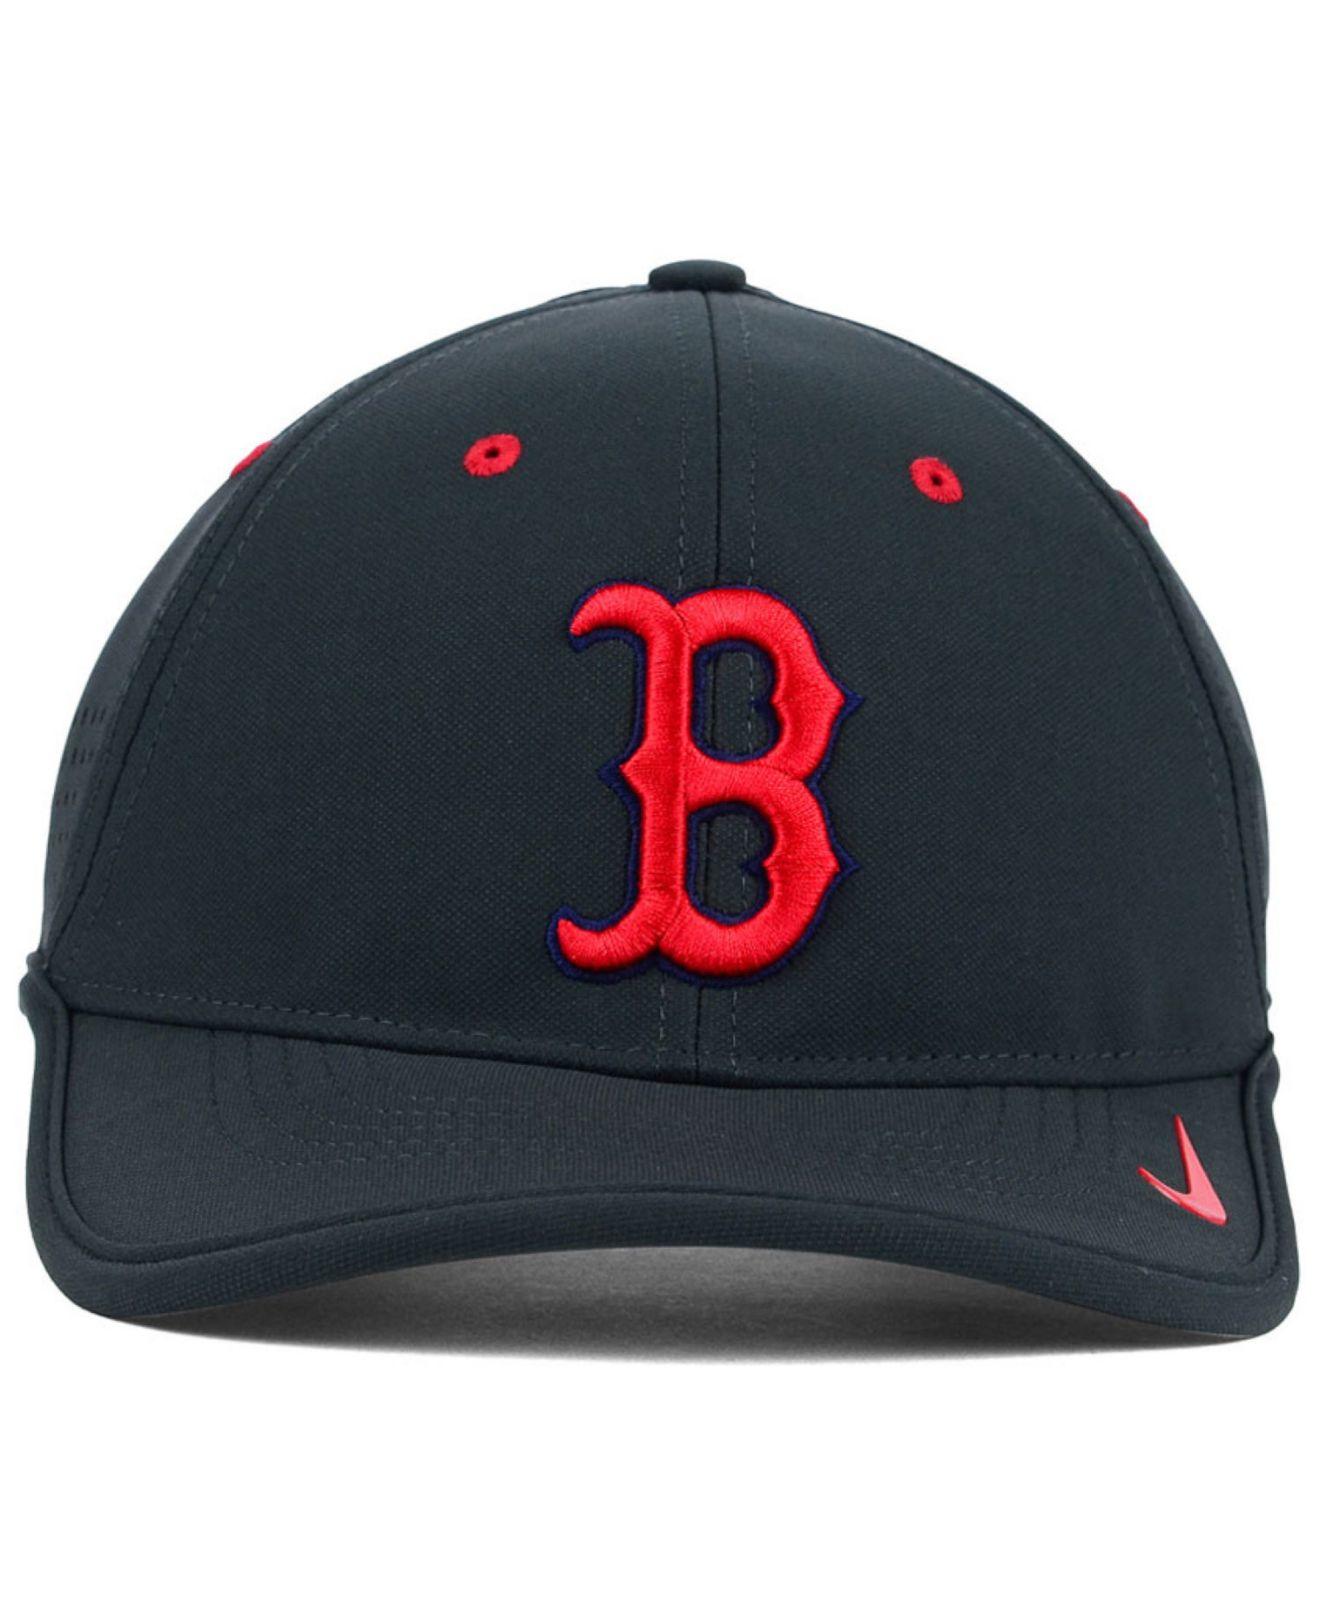 NikeMen's Gray Boston Red Sox Vapor Swoosh Adjustable Cap